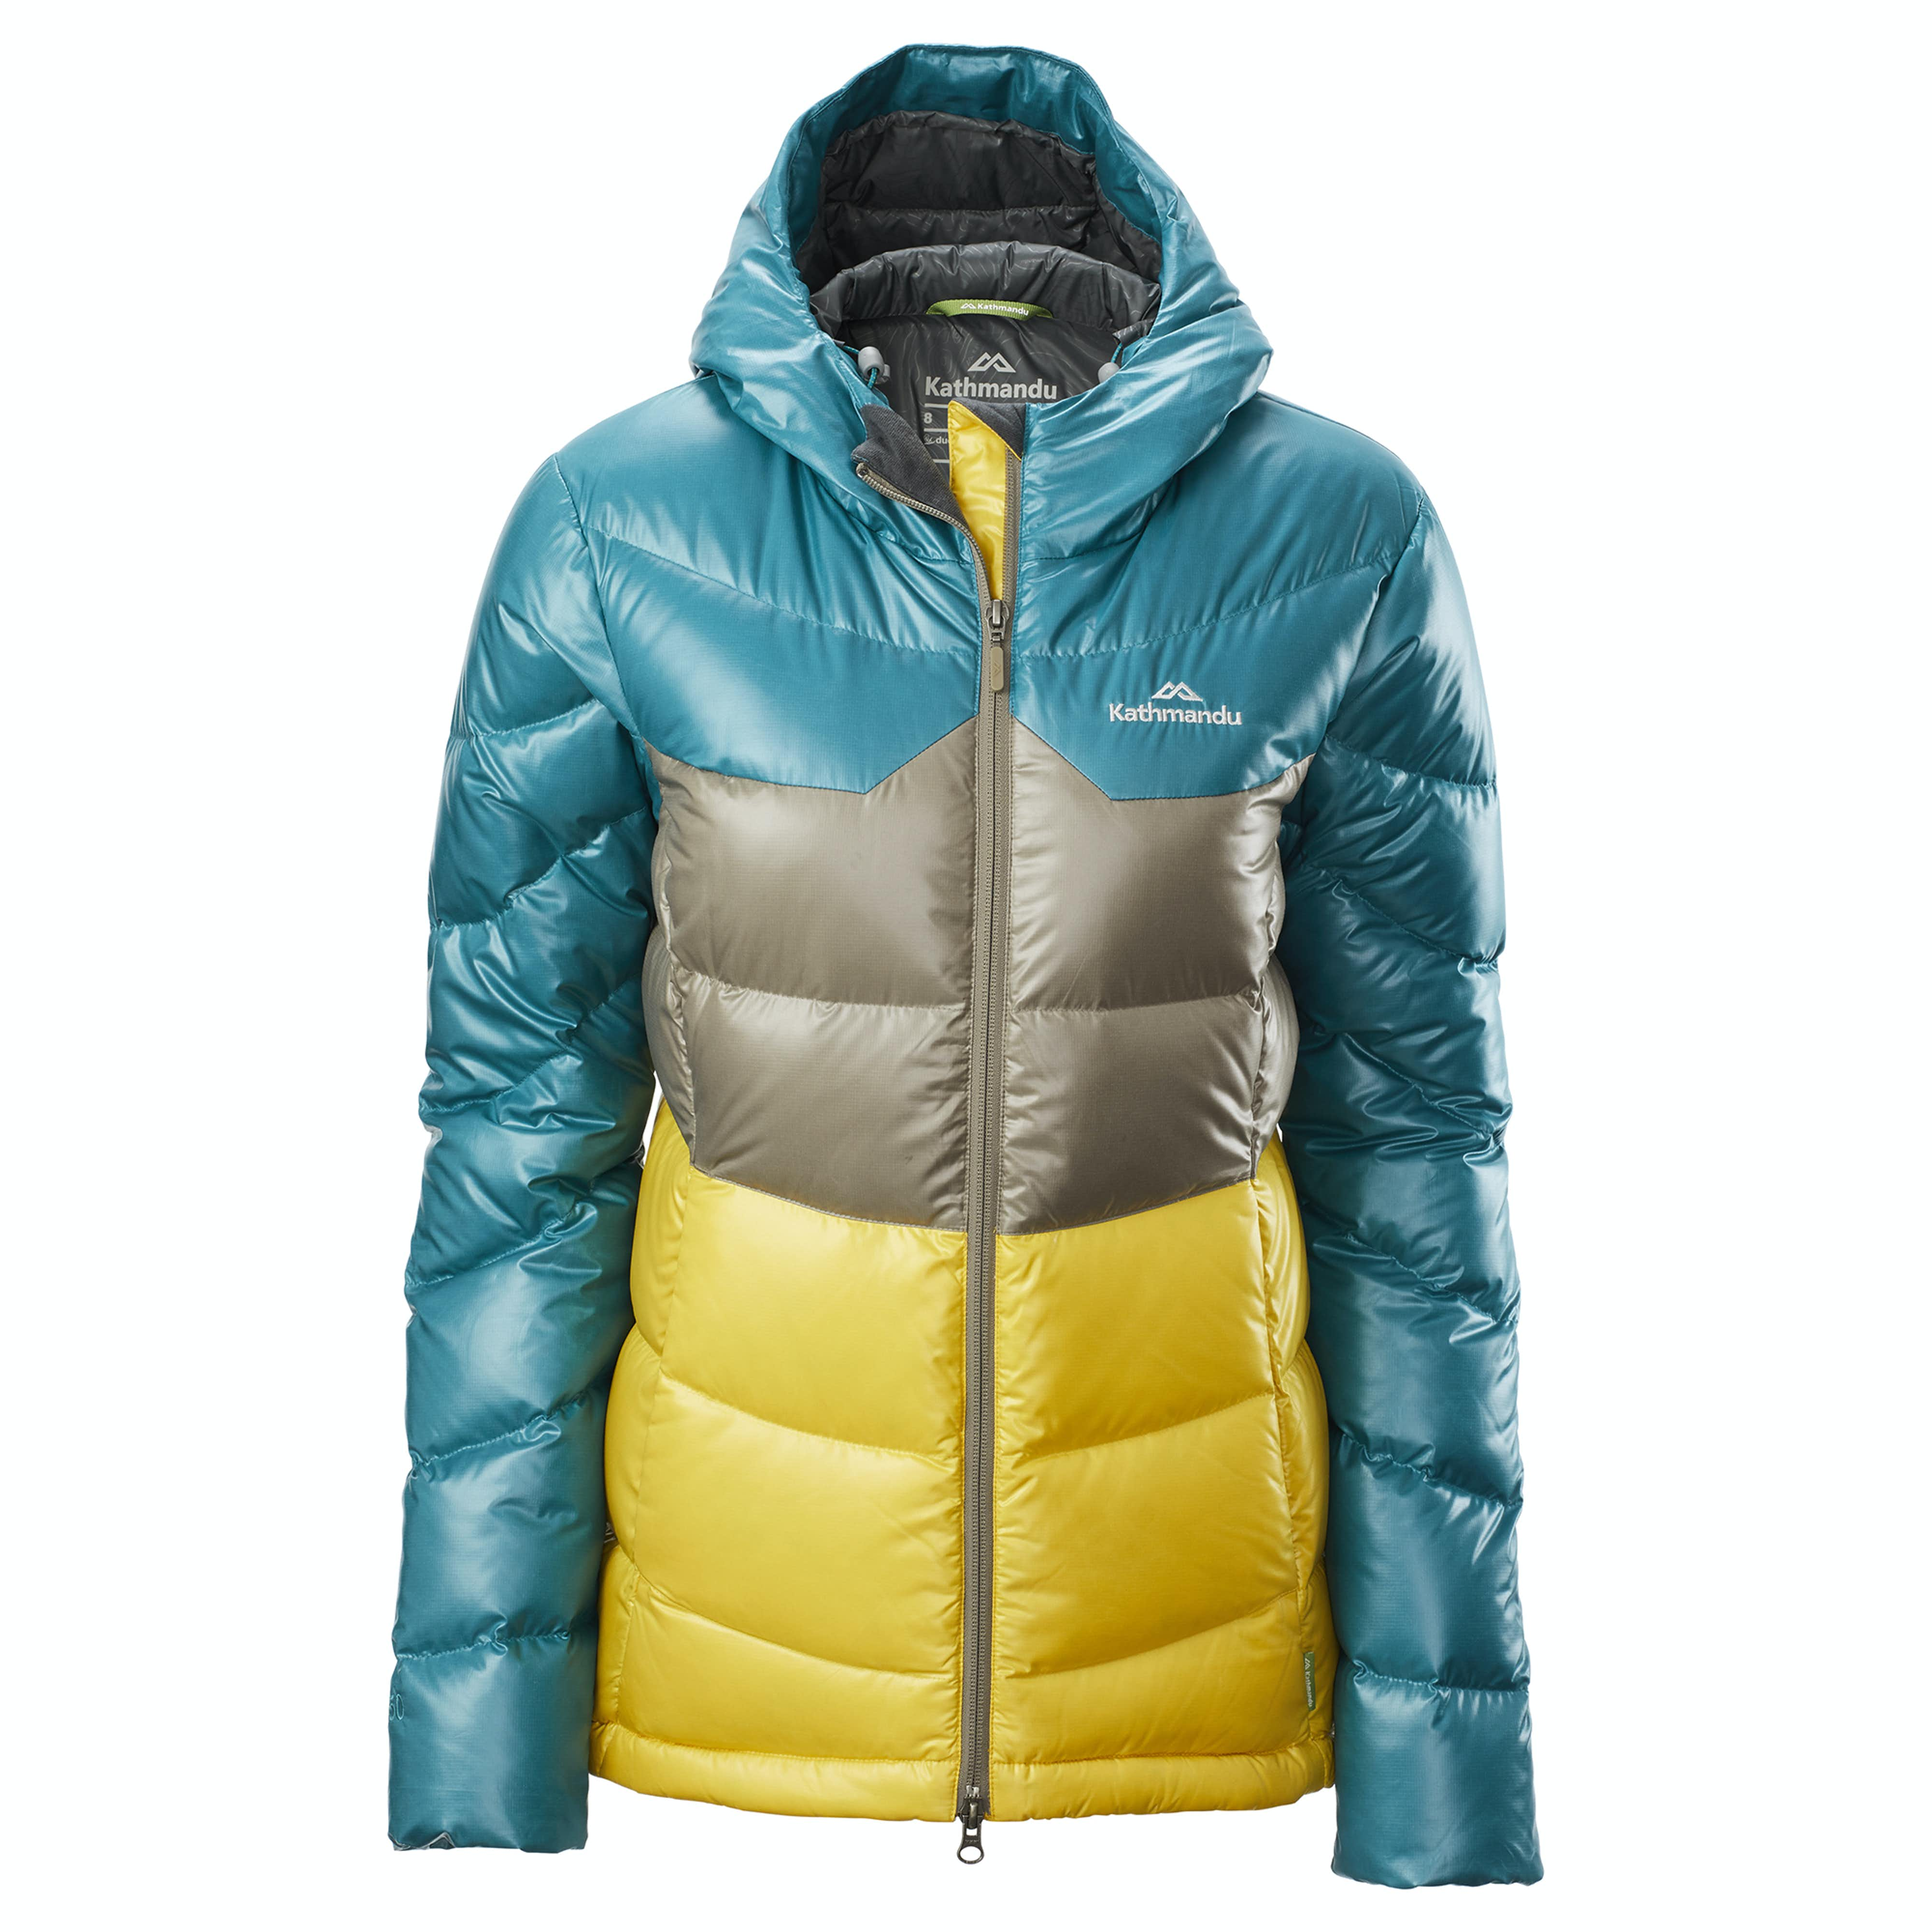 9a89767891c68 Womens Jackets & Coats | Winter Coats for Women | Kathmandu AU